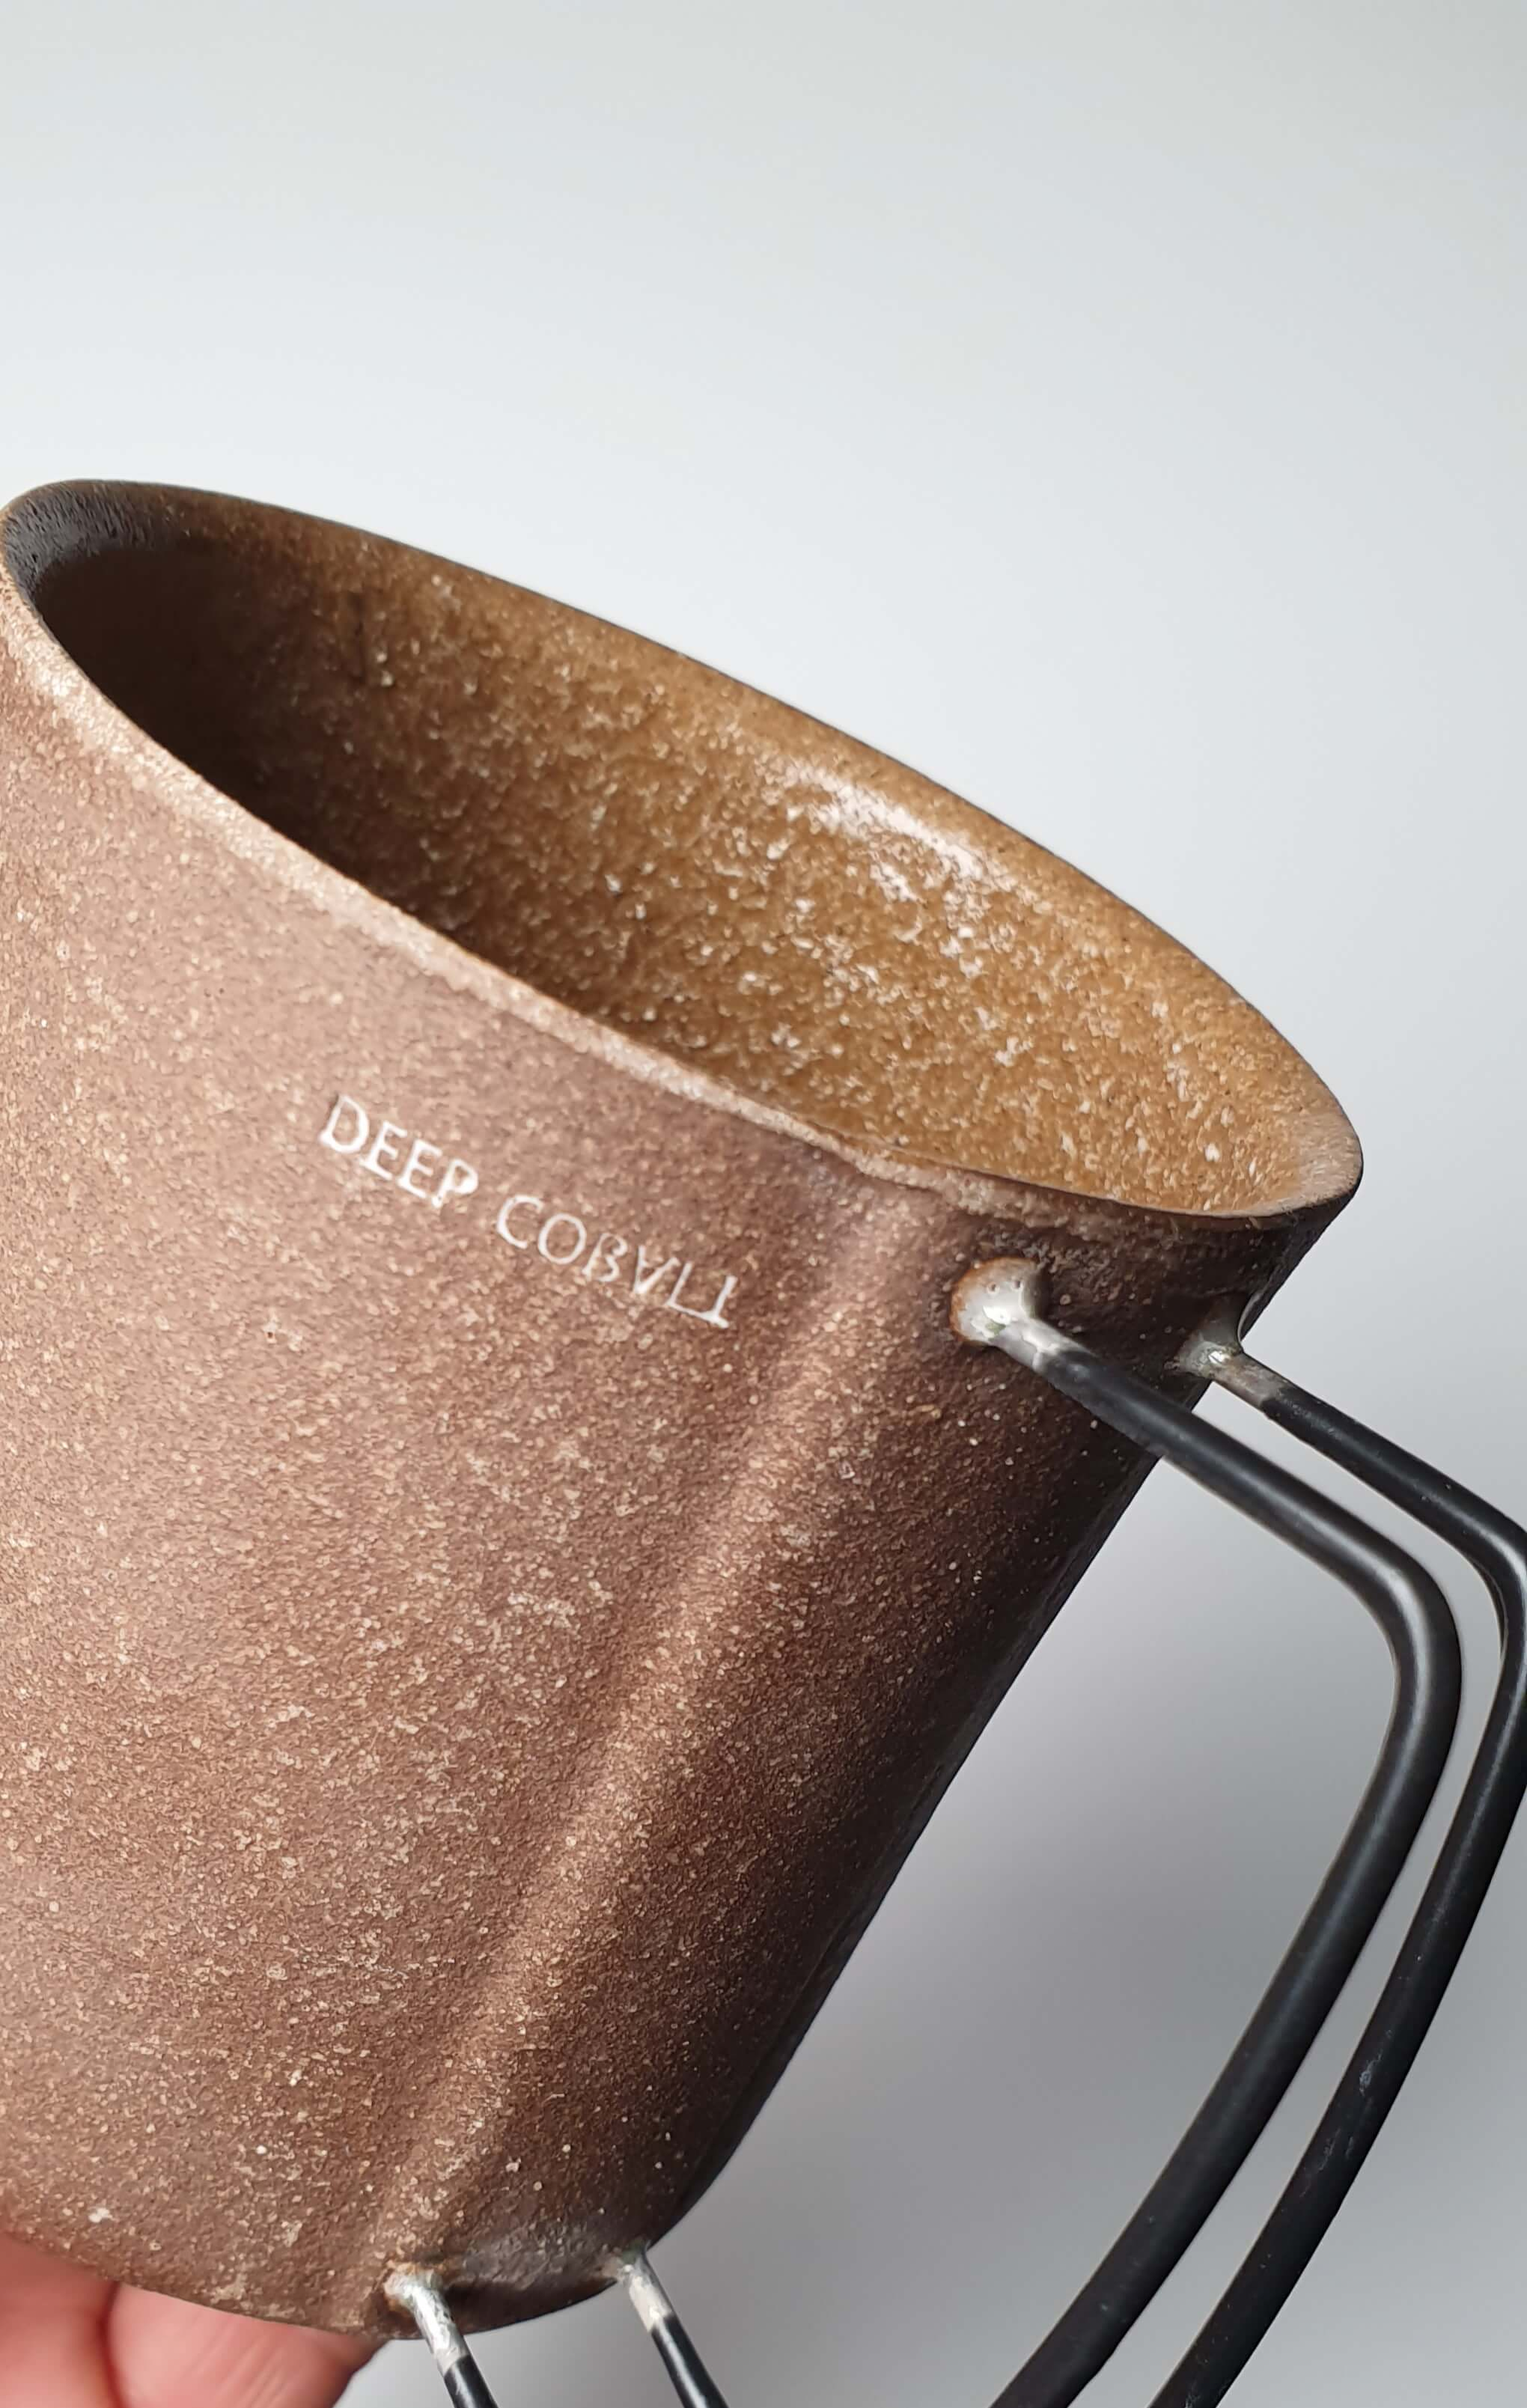 Vintage Latte Mug in dark brown colour